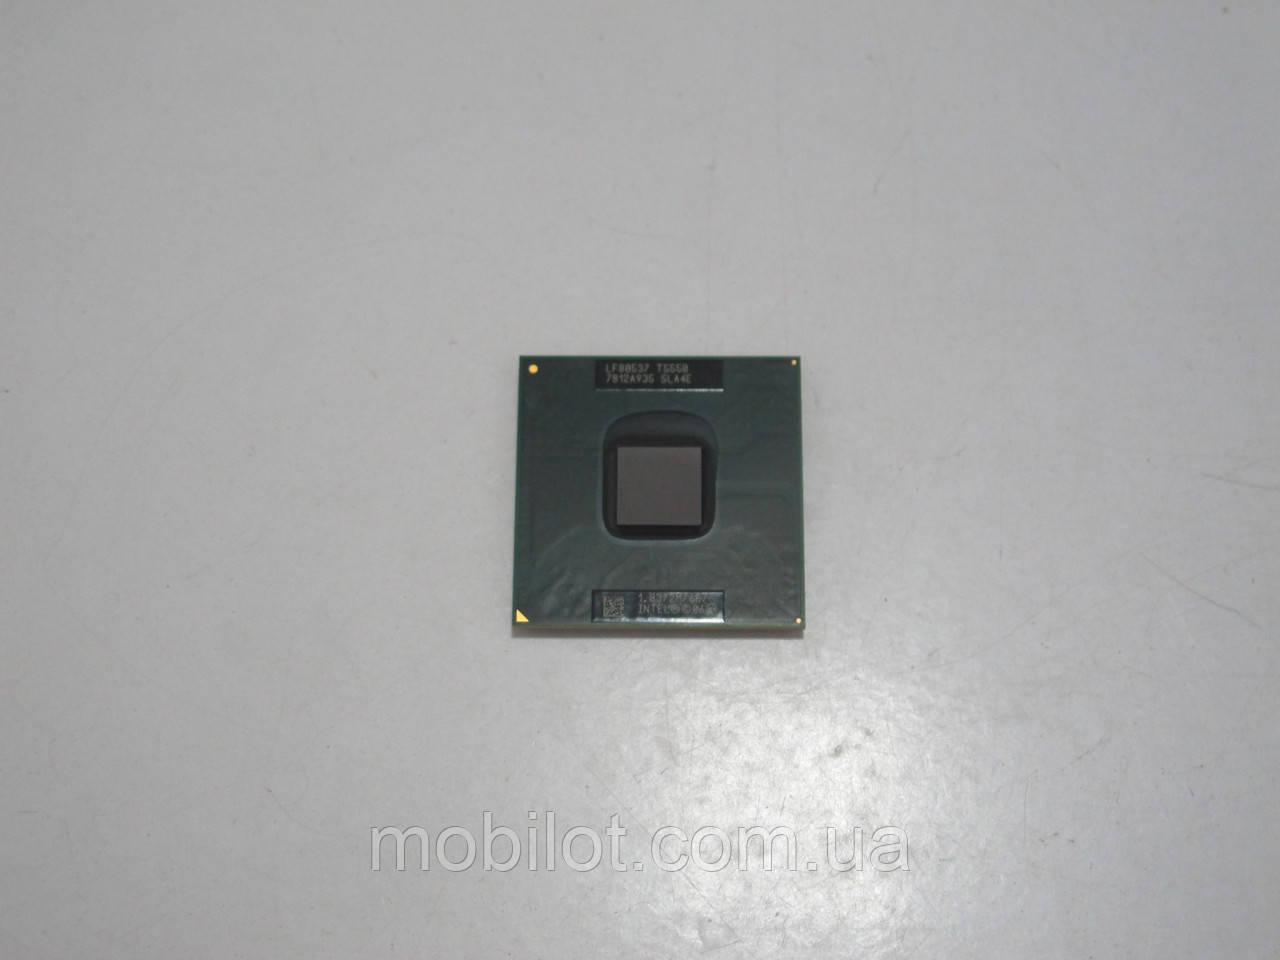 Процессор Intel Core 2 Duo T5550 (NZ-6441)